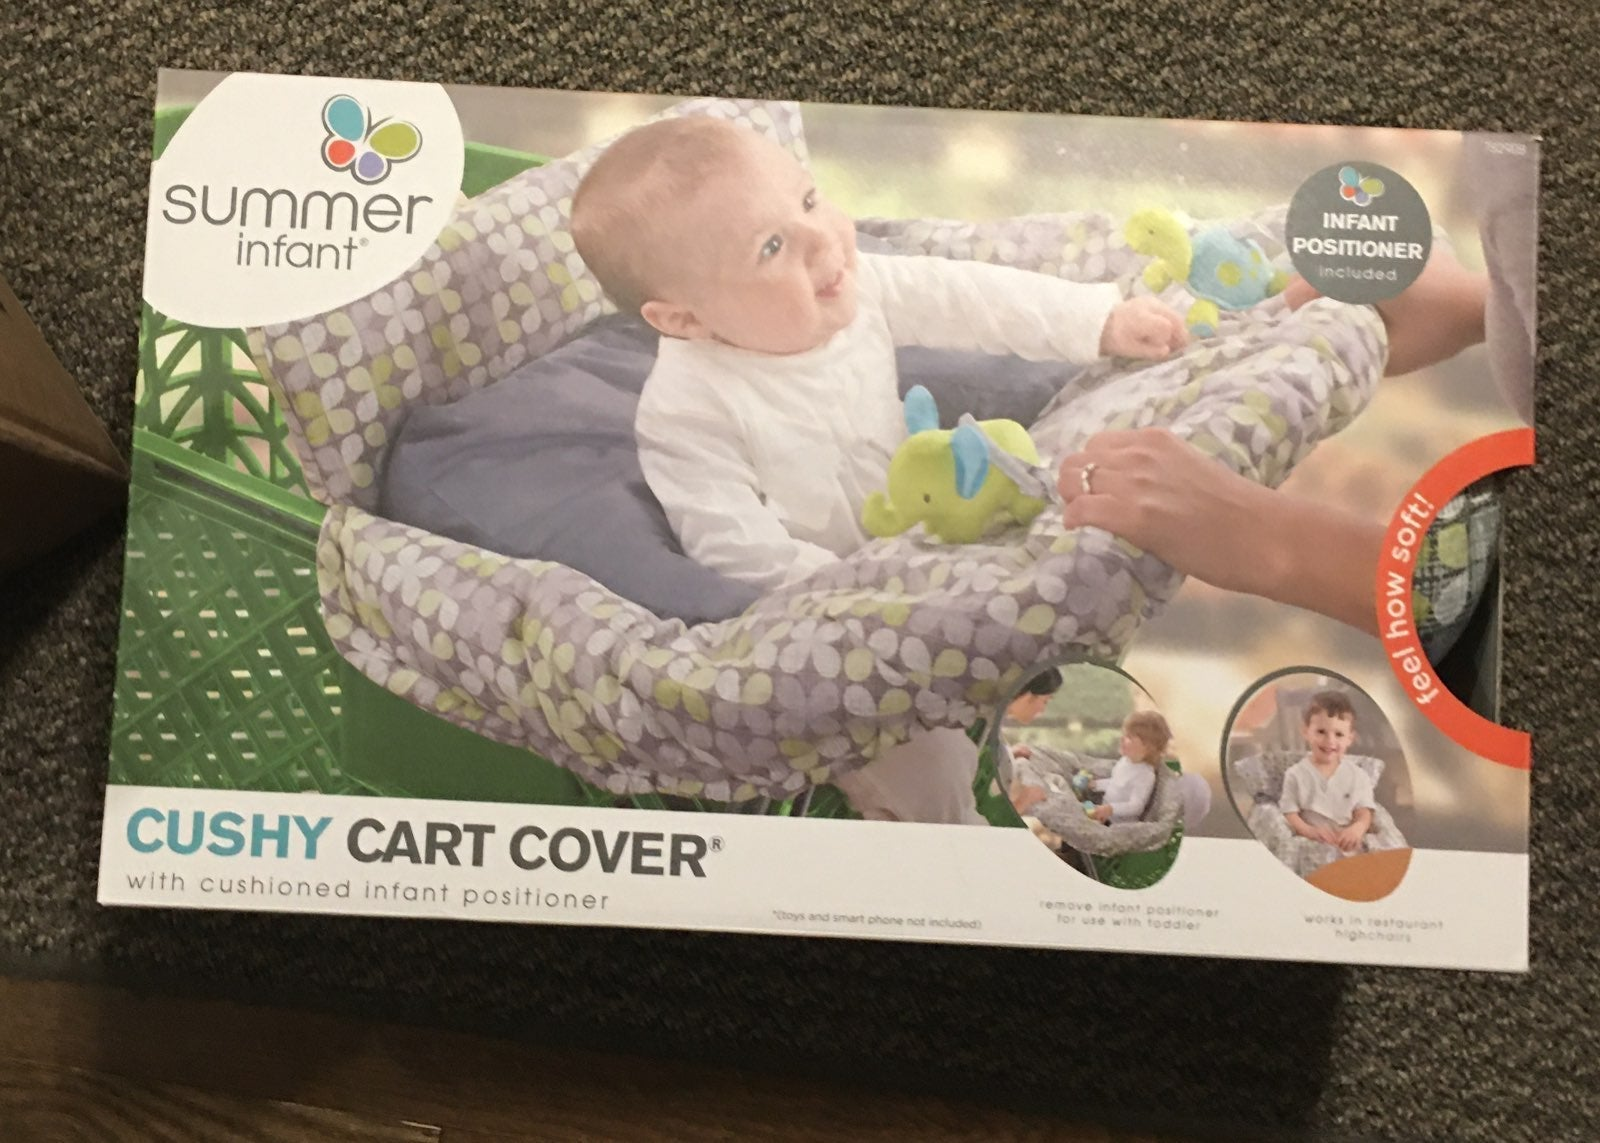 Summer infant cushy cart cover NIB